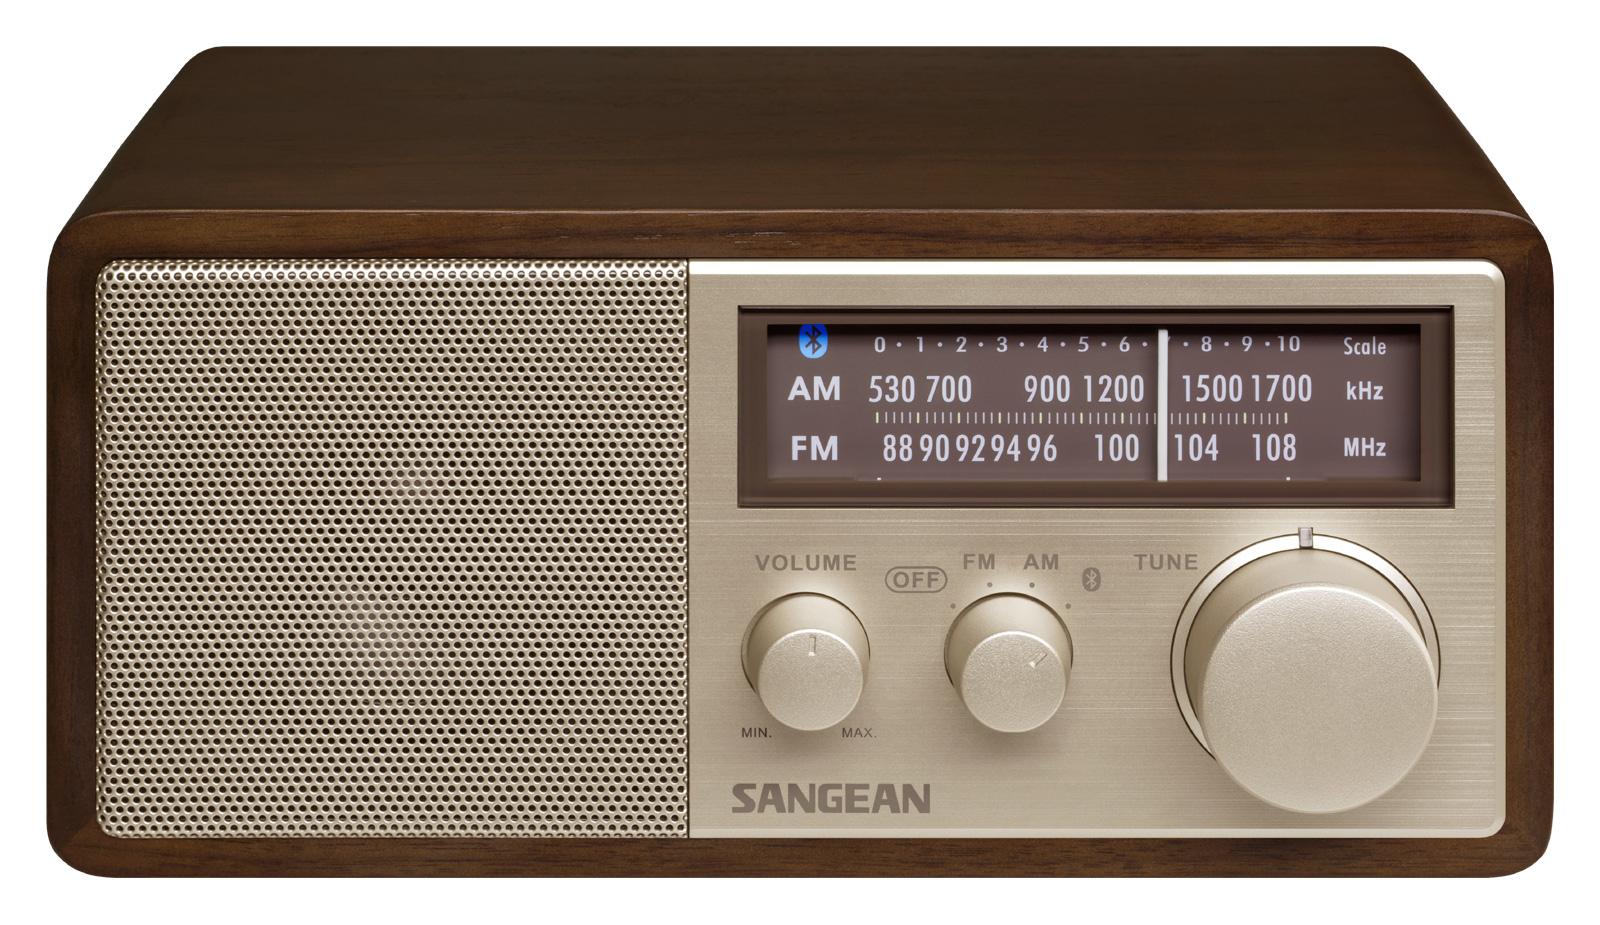 Sangean WR-11 BT - Tafel radio met bluetooth - Walnoot